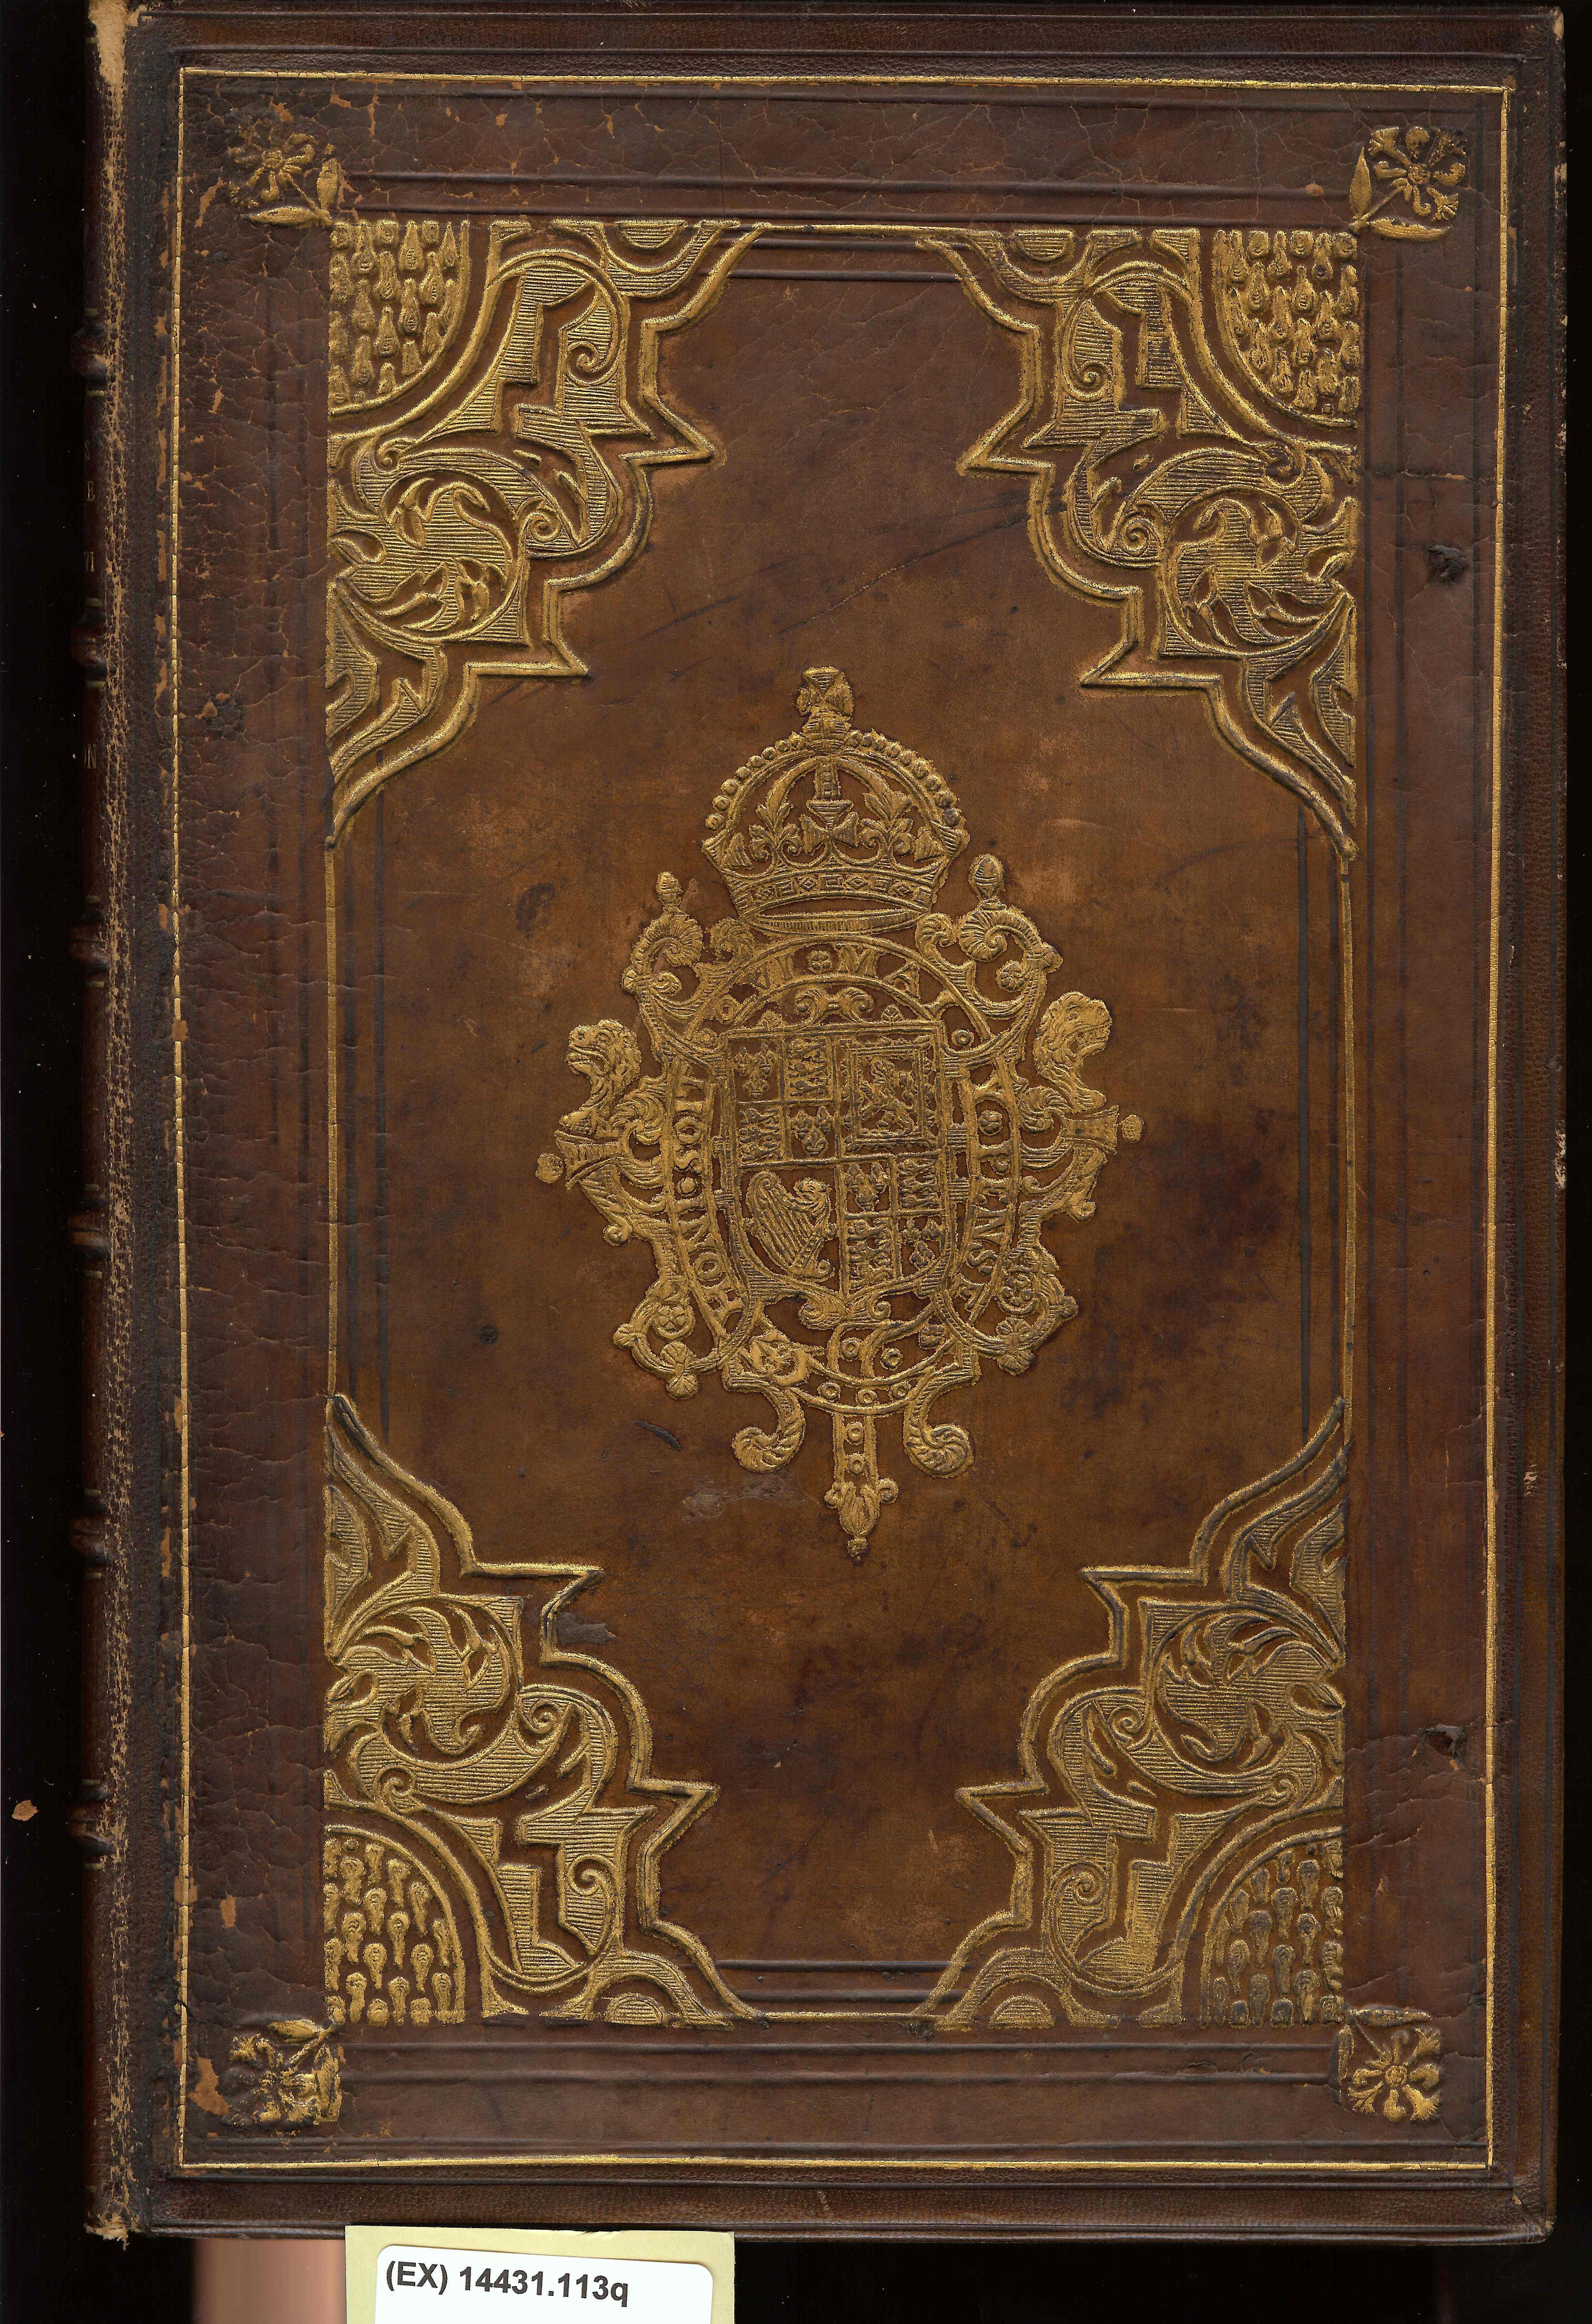 http://blogs.princeton.edu/rarebooks/images/1618_Adamson.JPG